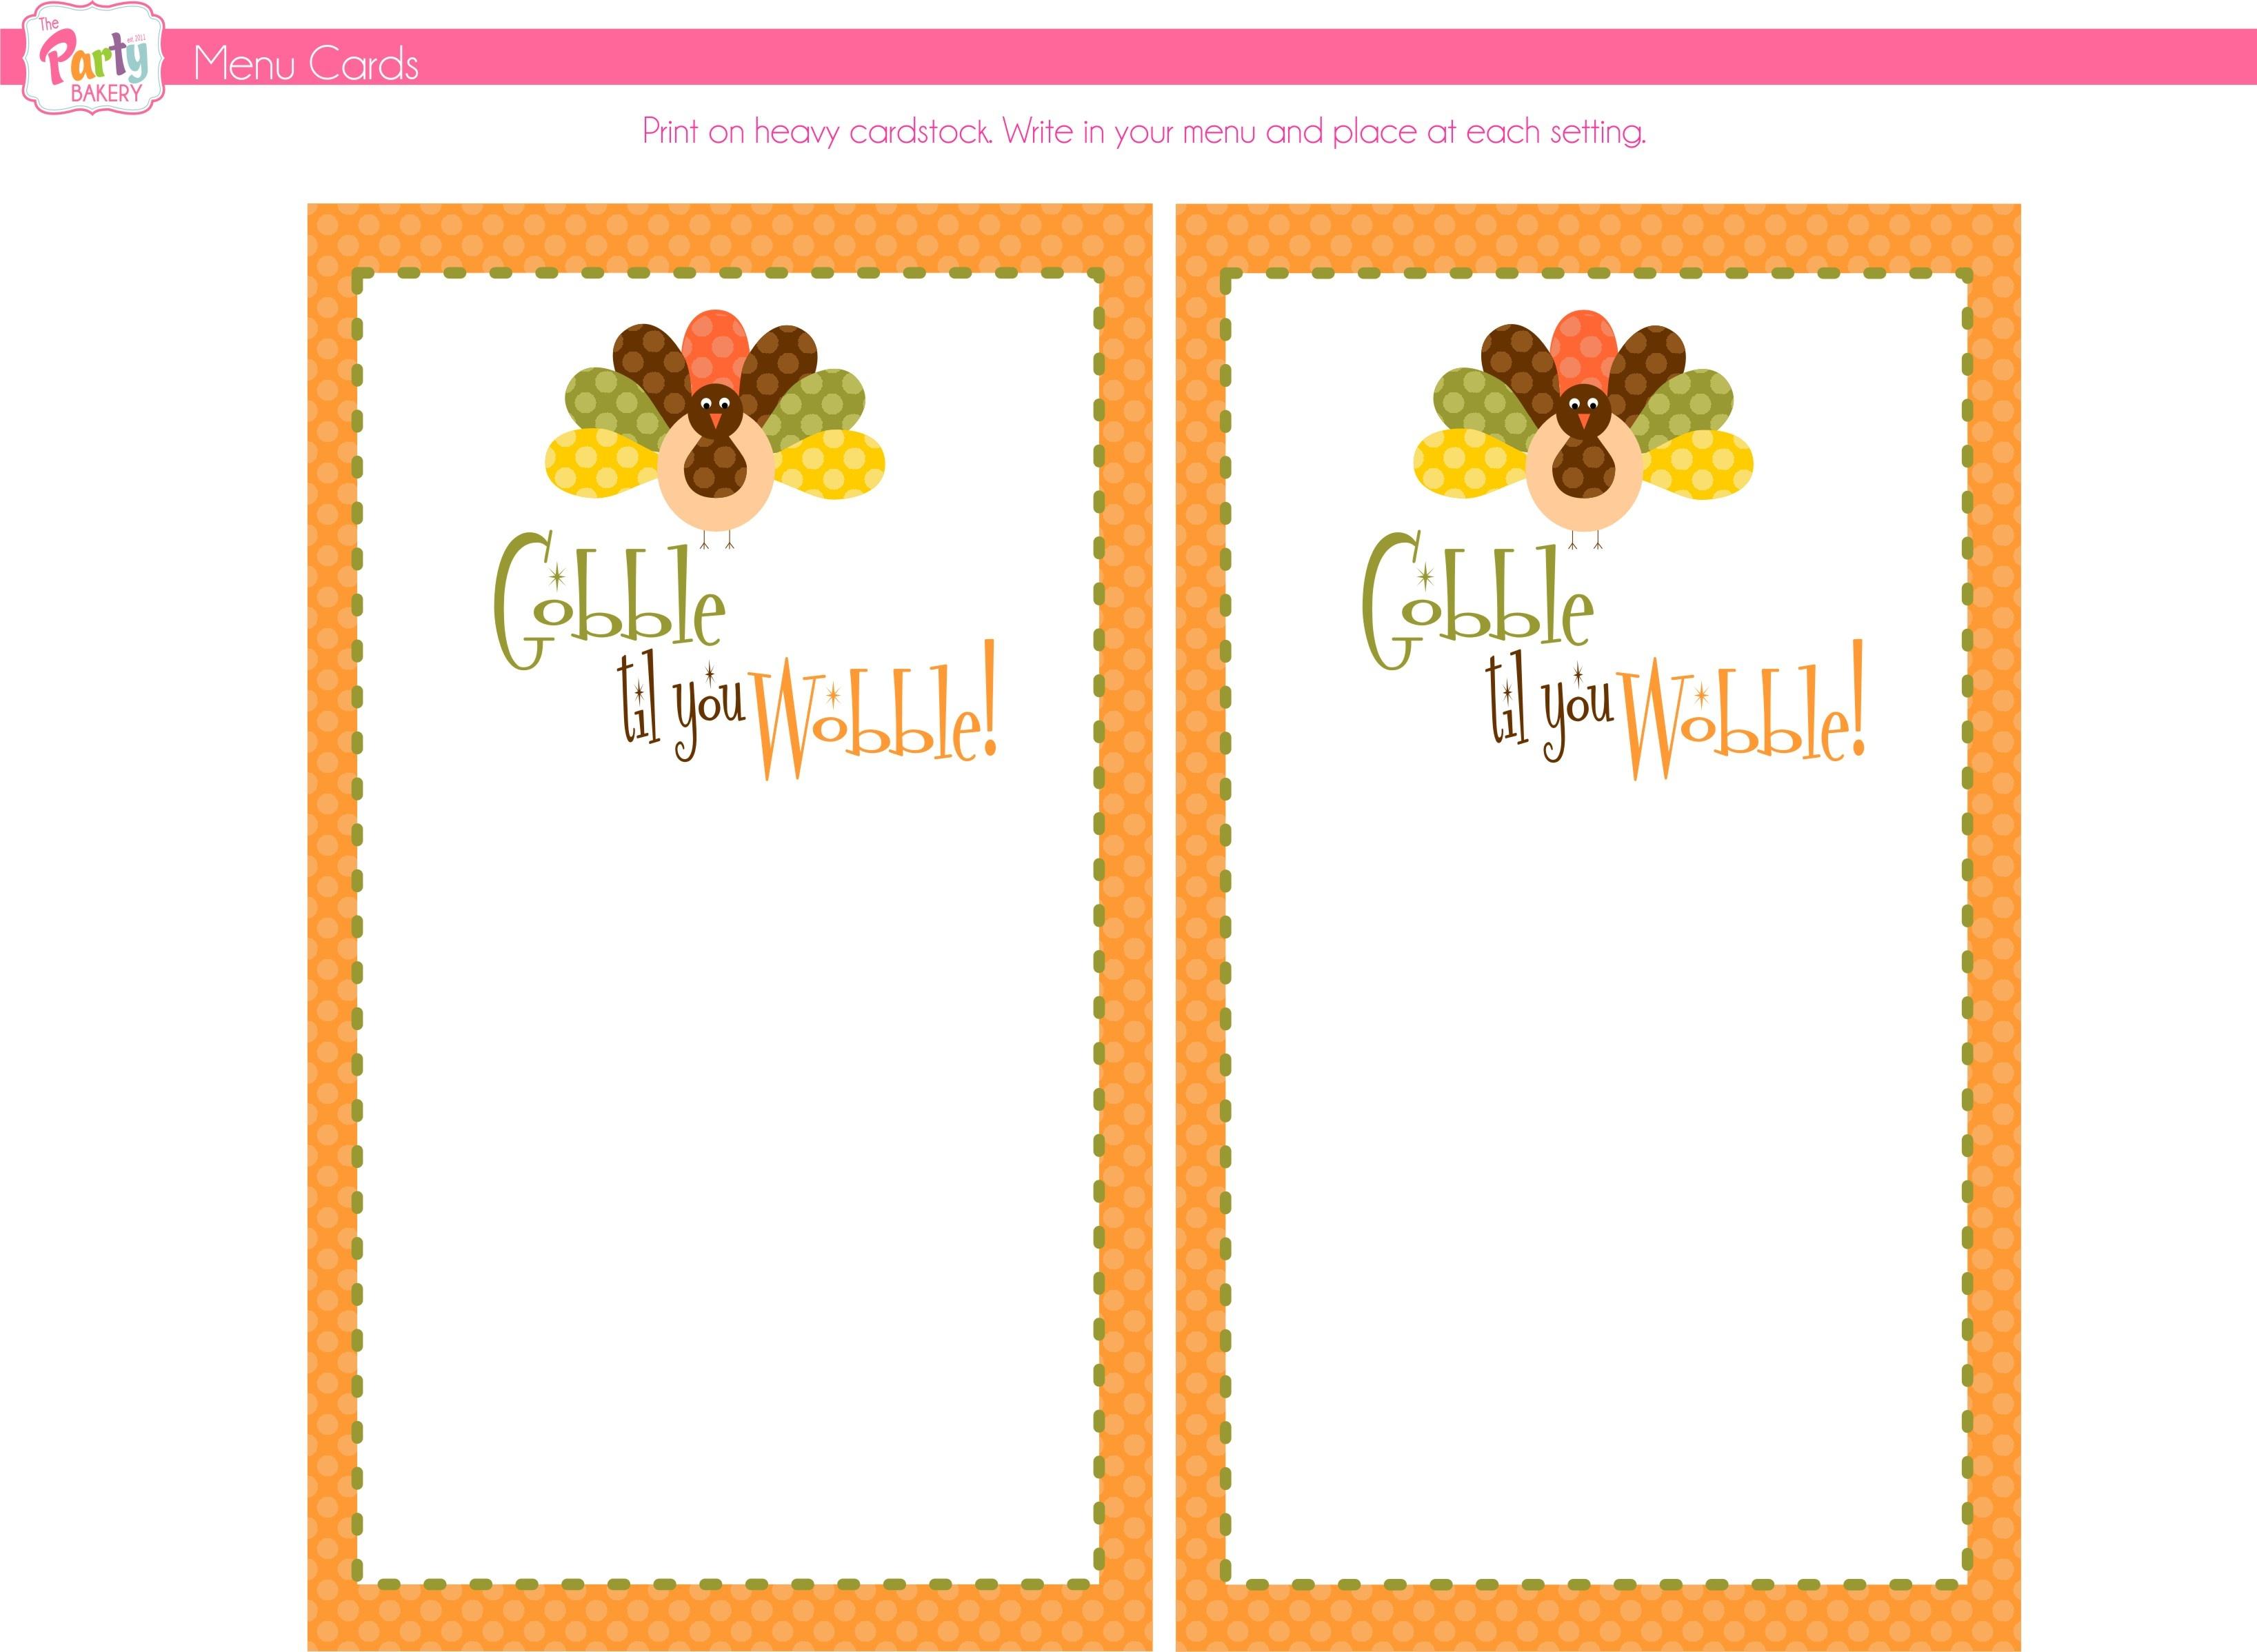 Printable Thanksgiving Menu Templates For Free – Happy Easter - Free Printable Thanksgiving Menu Template